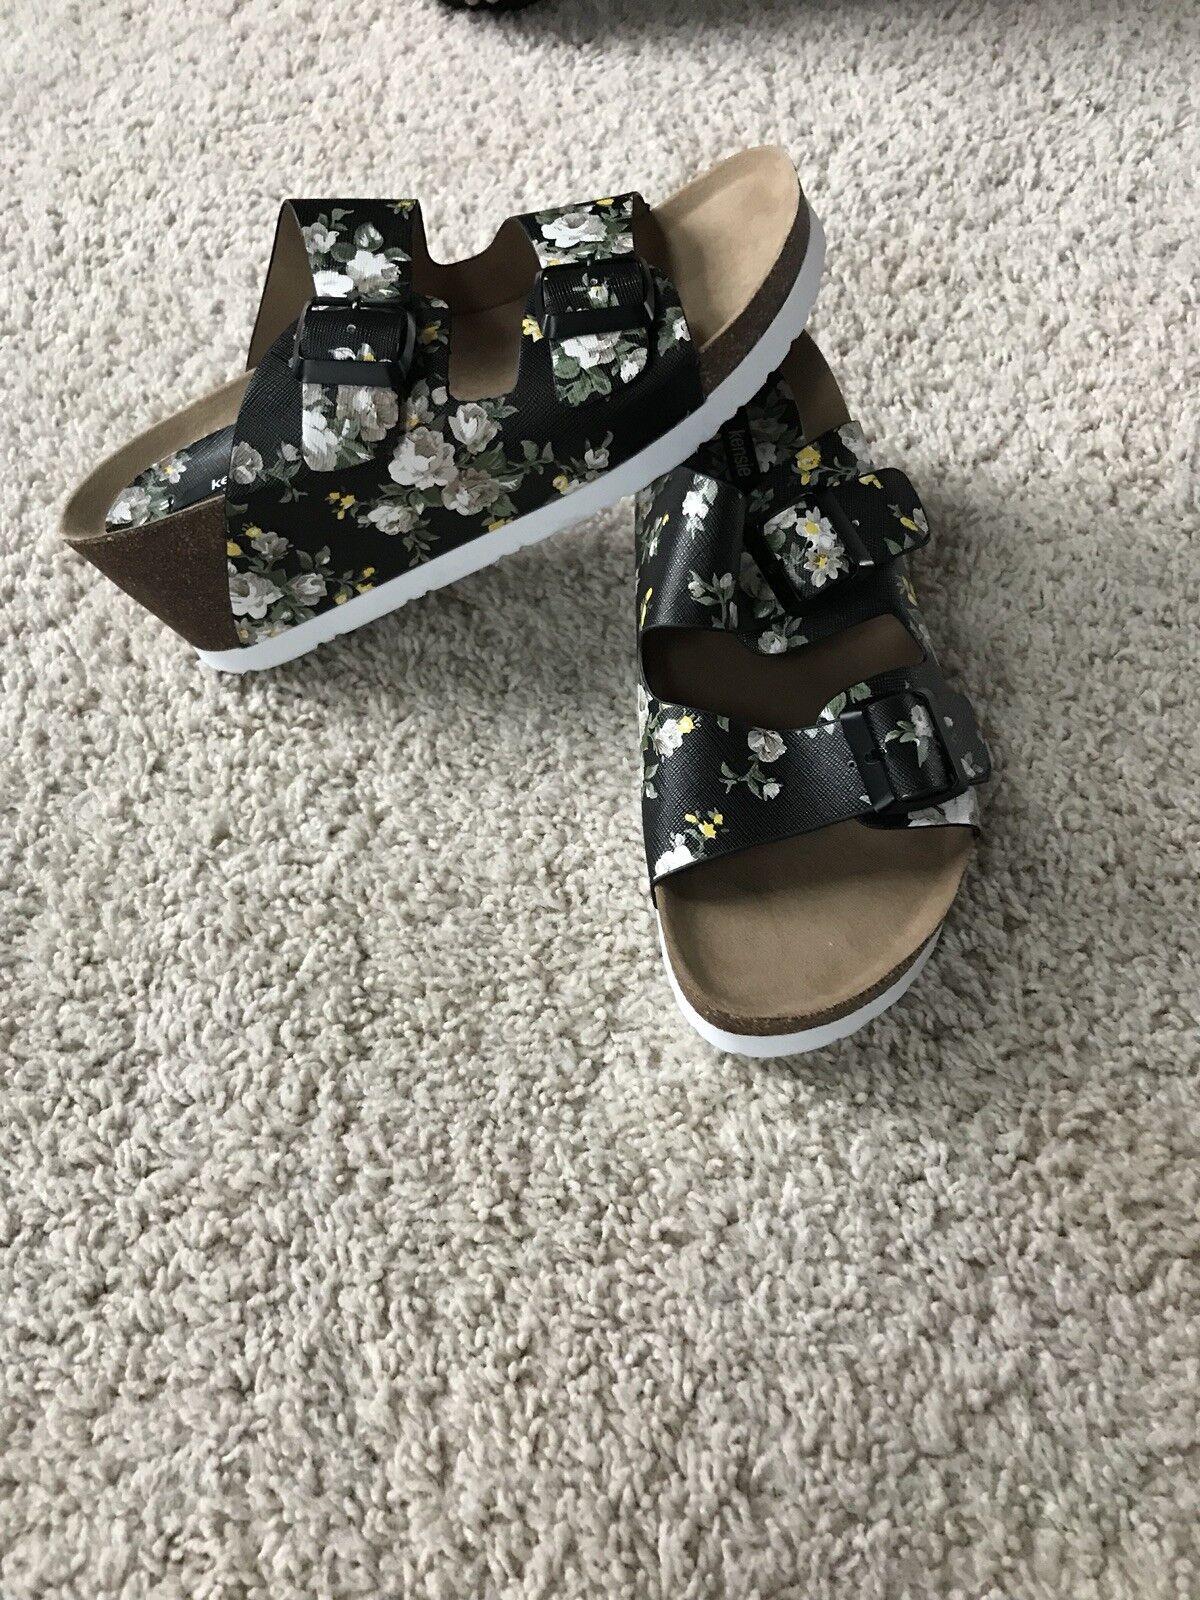 New Fergie Women Magnetize Leather Sandal Shoes Size 7 (MSRP ) Black